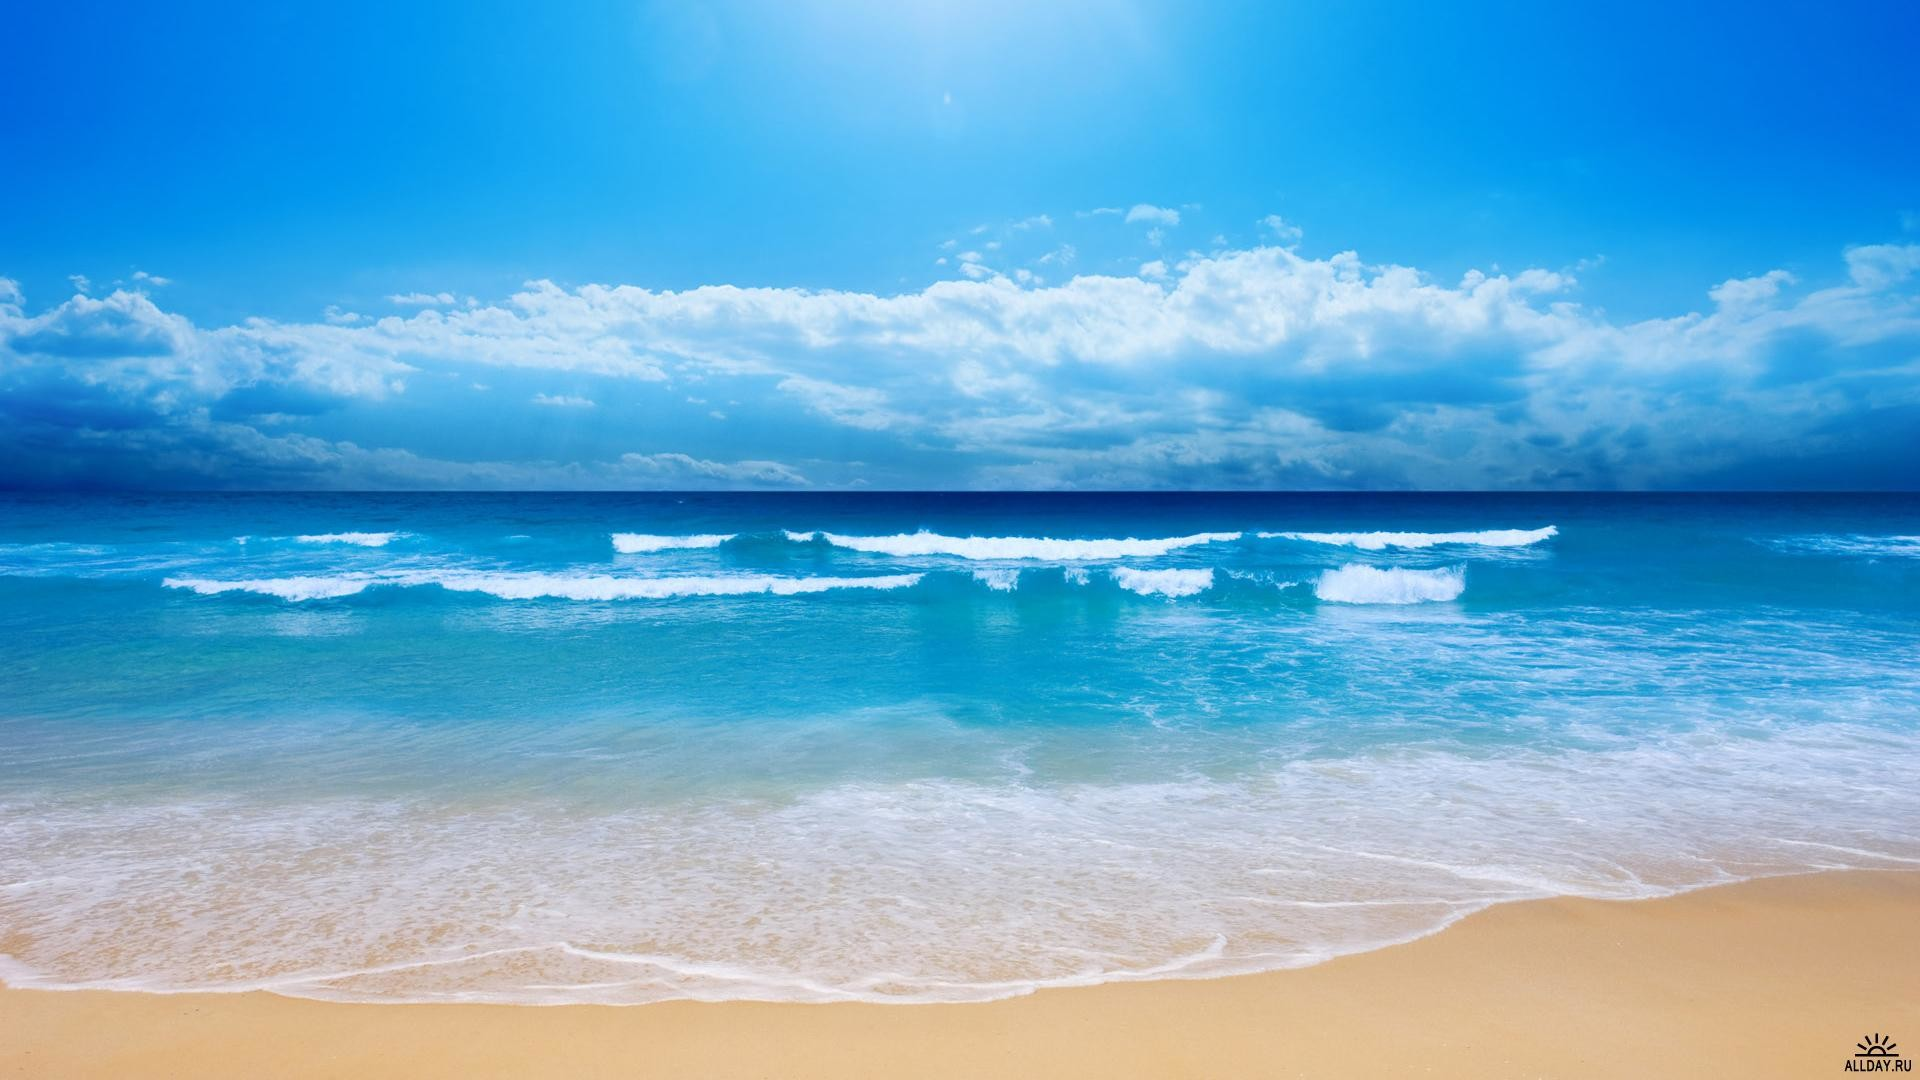 Water, glass, wave, background, desktops, royalty, images .